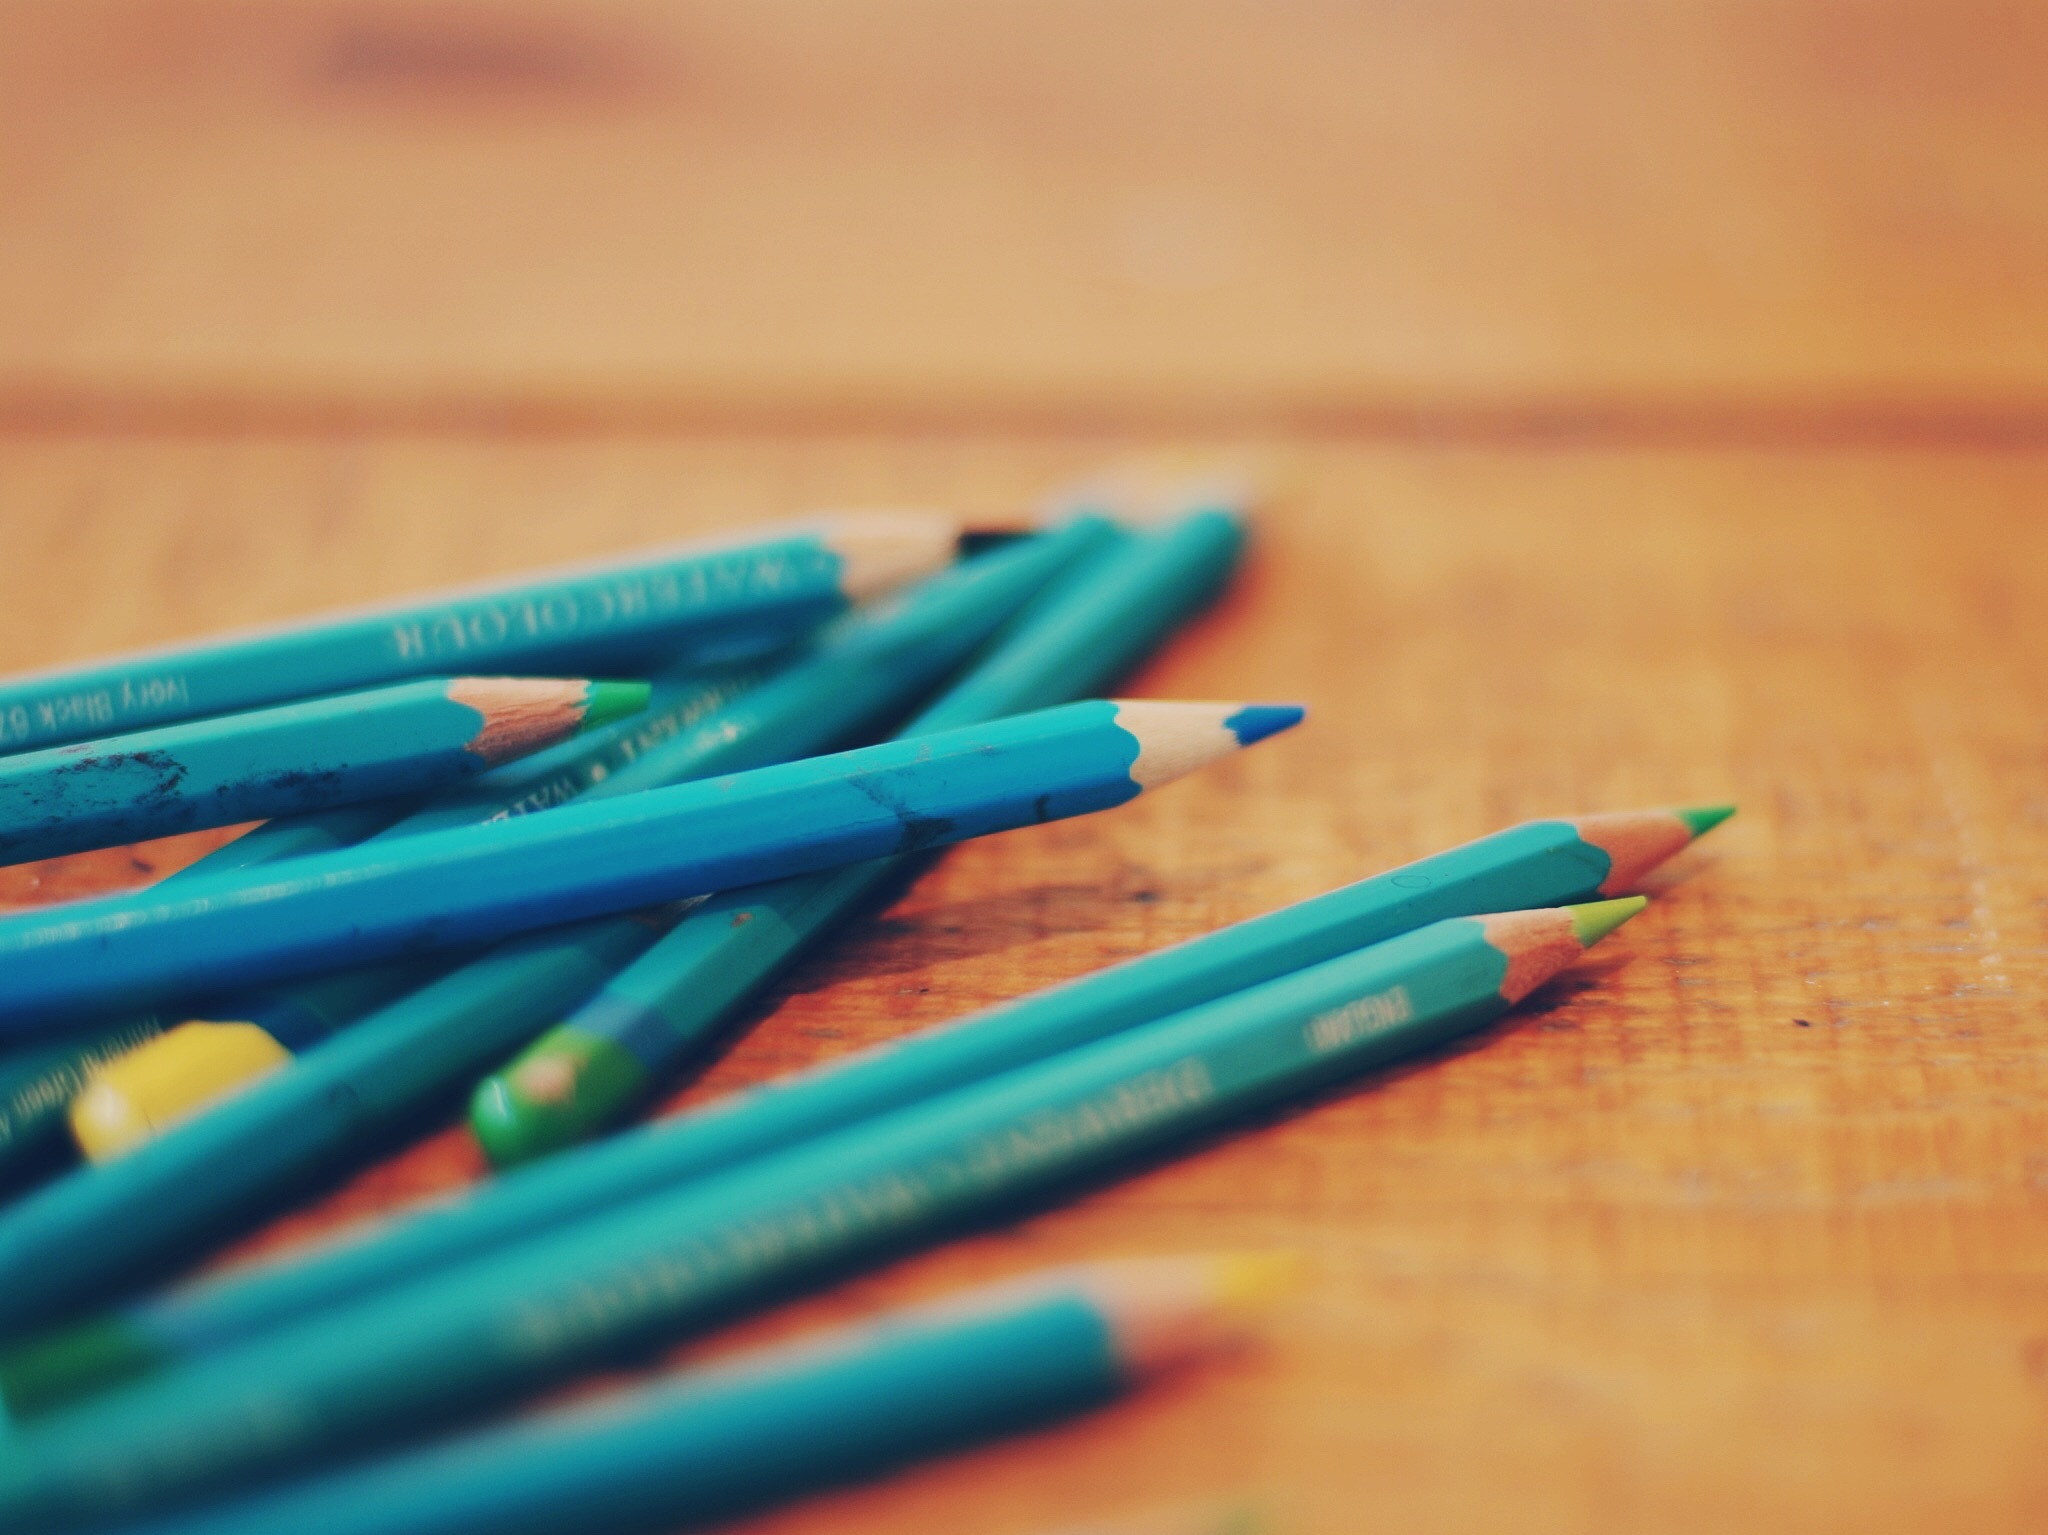 Pencils3.jpg